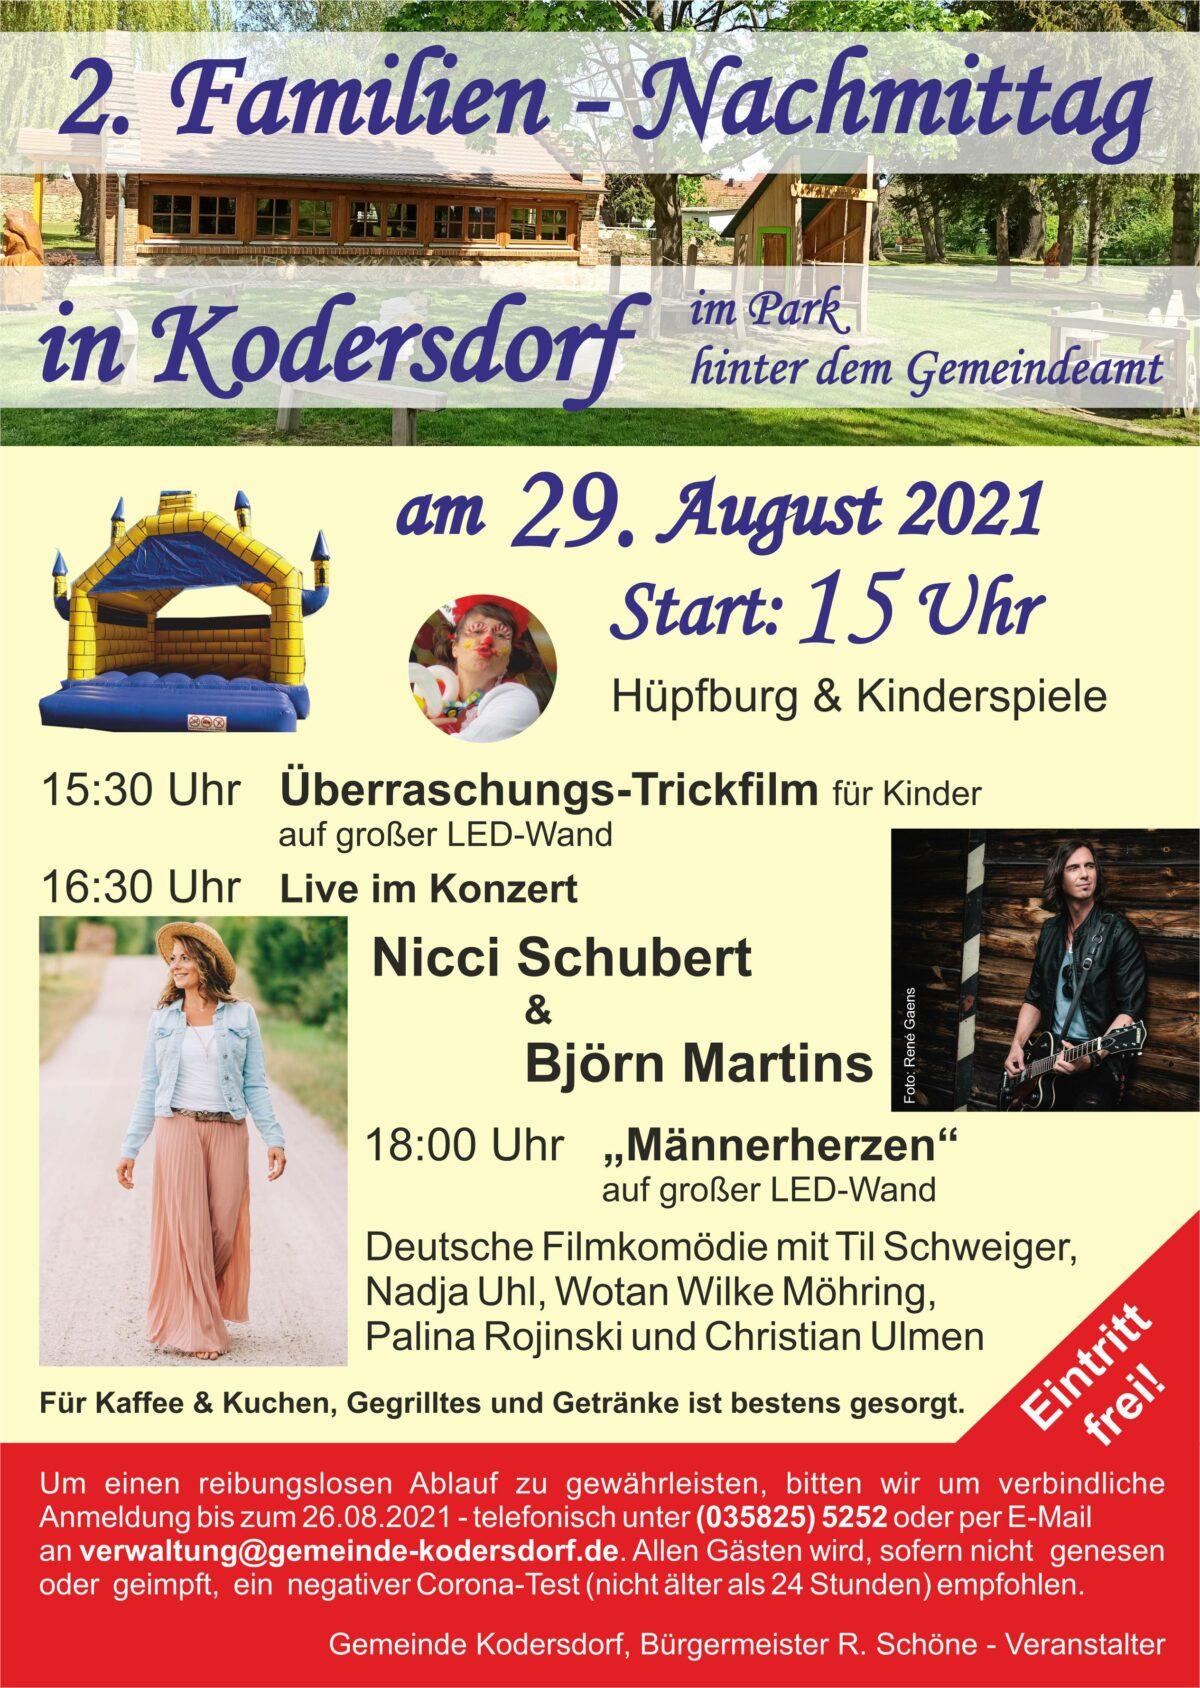 2. Familien-Nachmittag in Kodersdorf